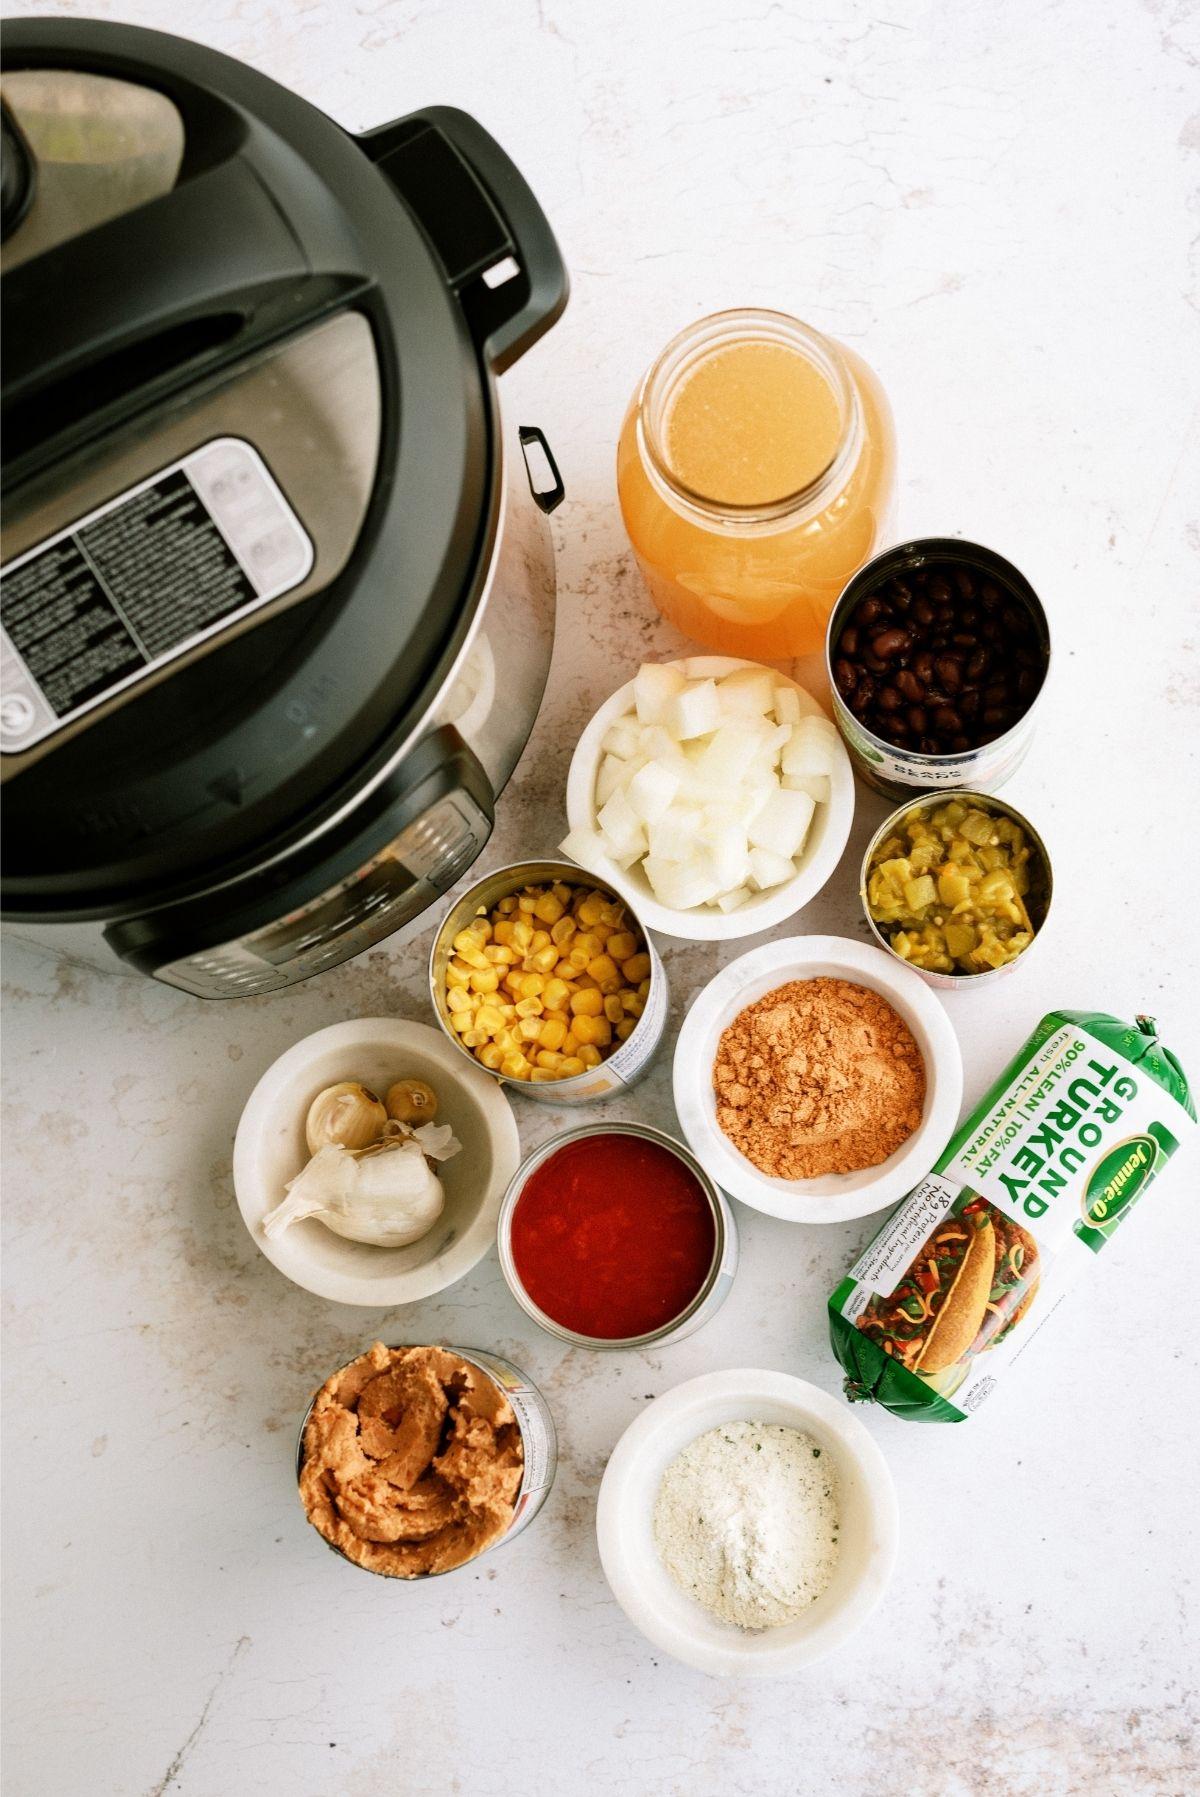 Ingredients for Instant Pot Ground Turkey Taco Chili Recipe